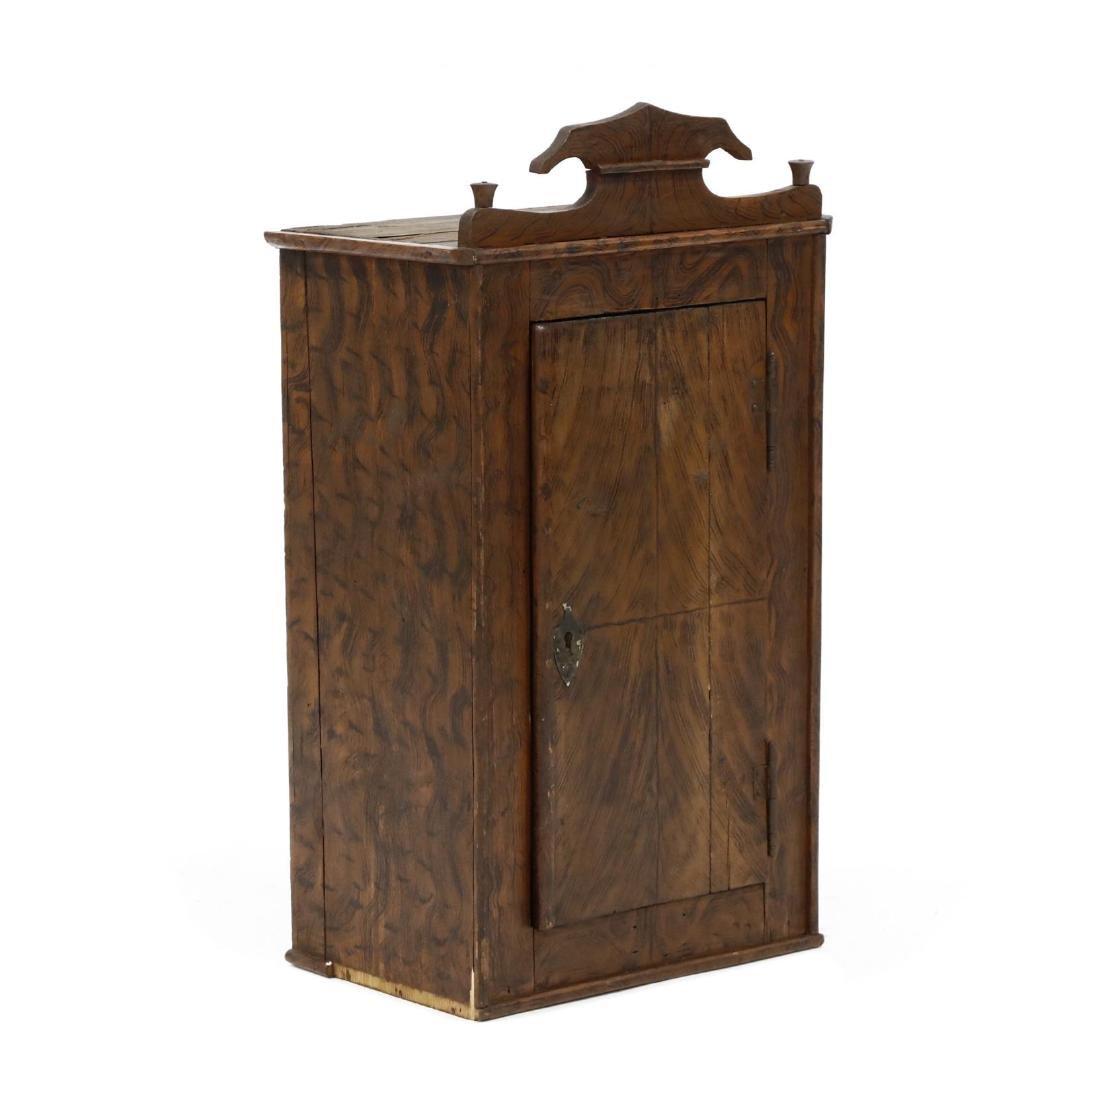 Antique Grain Painted Hanging Cabinet